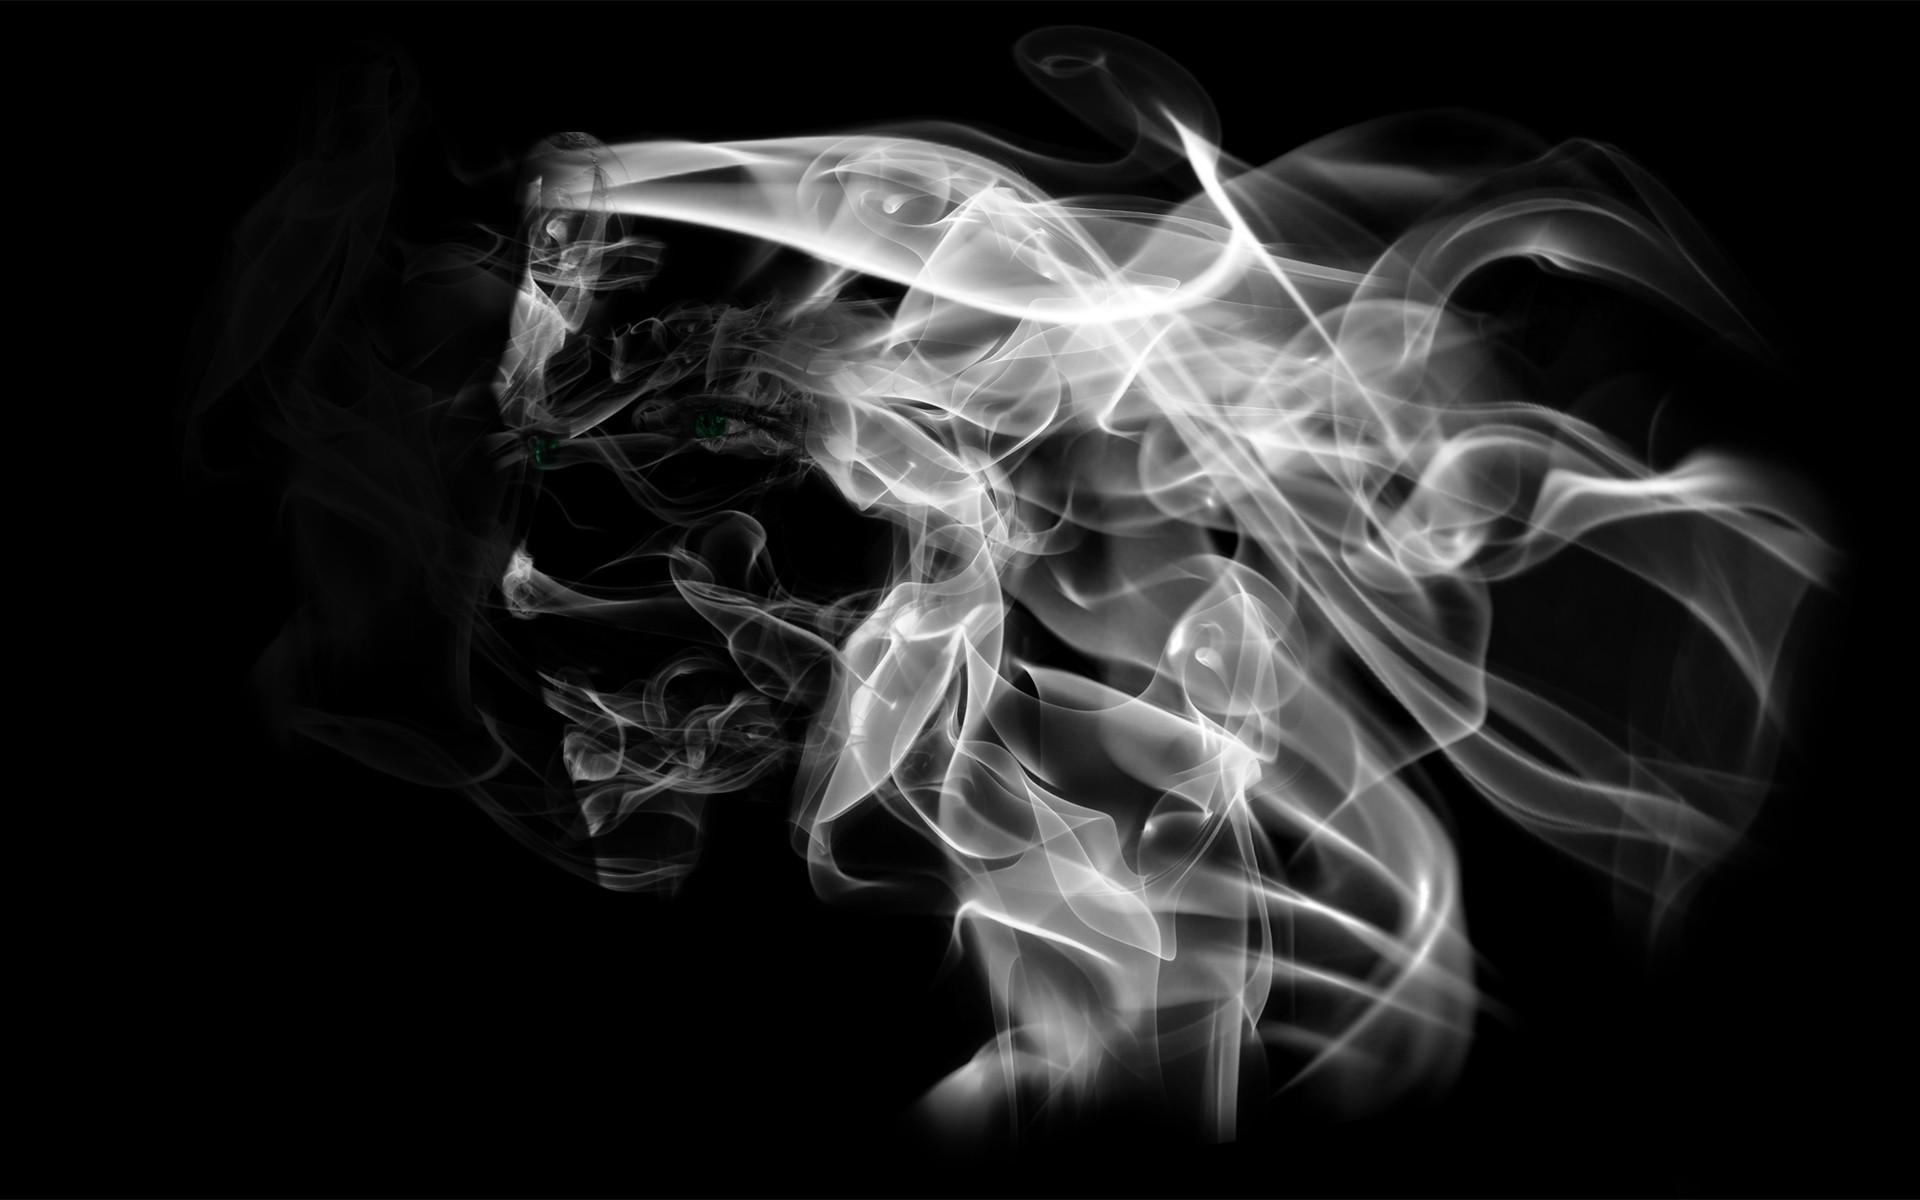 Smoke Photography Wallpaper HD #8945 Wallpaper | High Resolution .